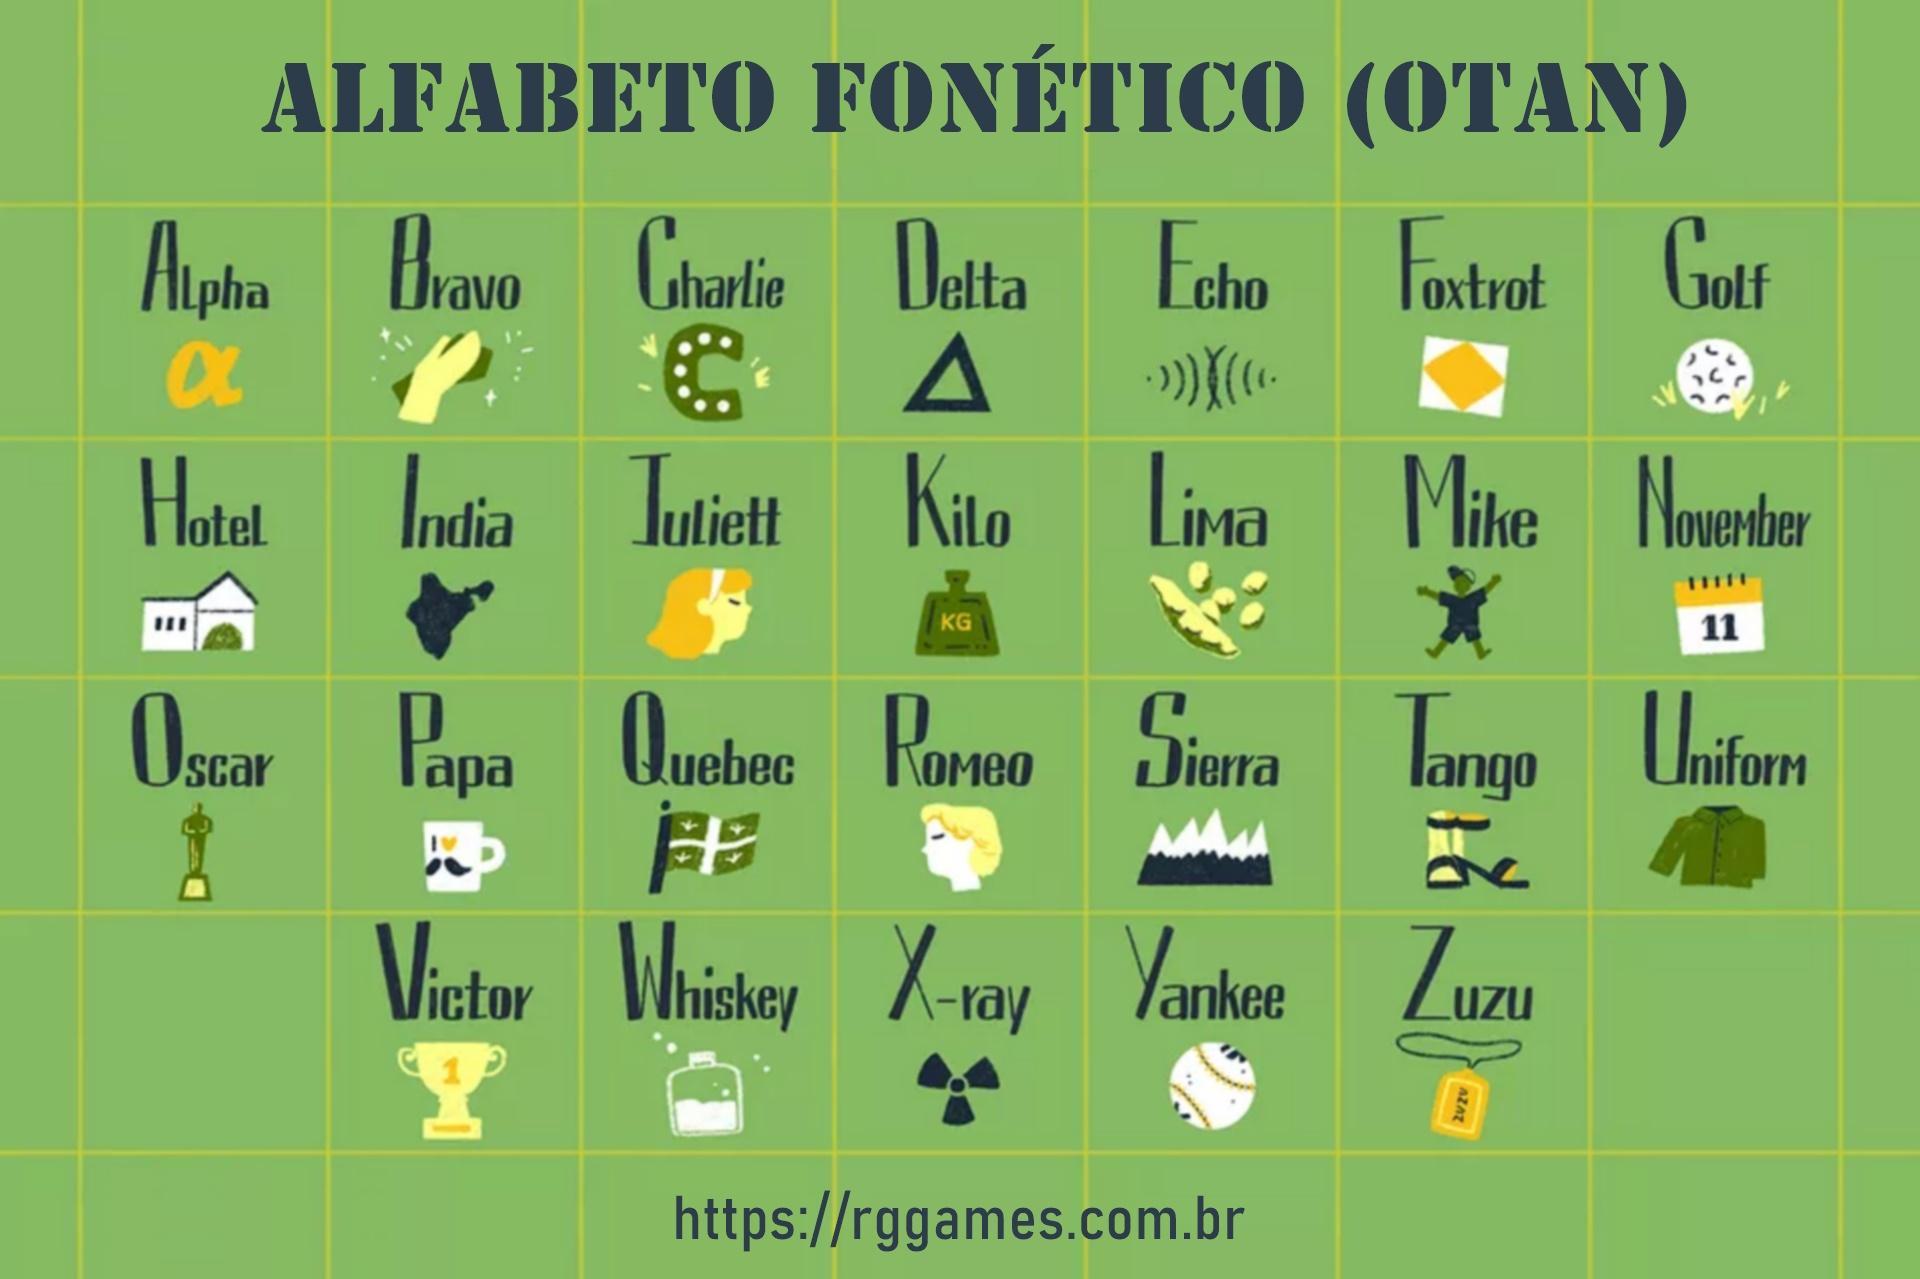 Alfabeto Fonético (OTAN)